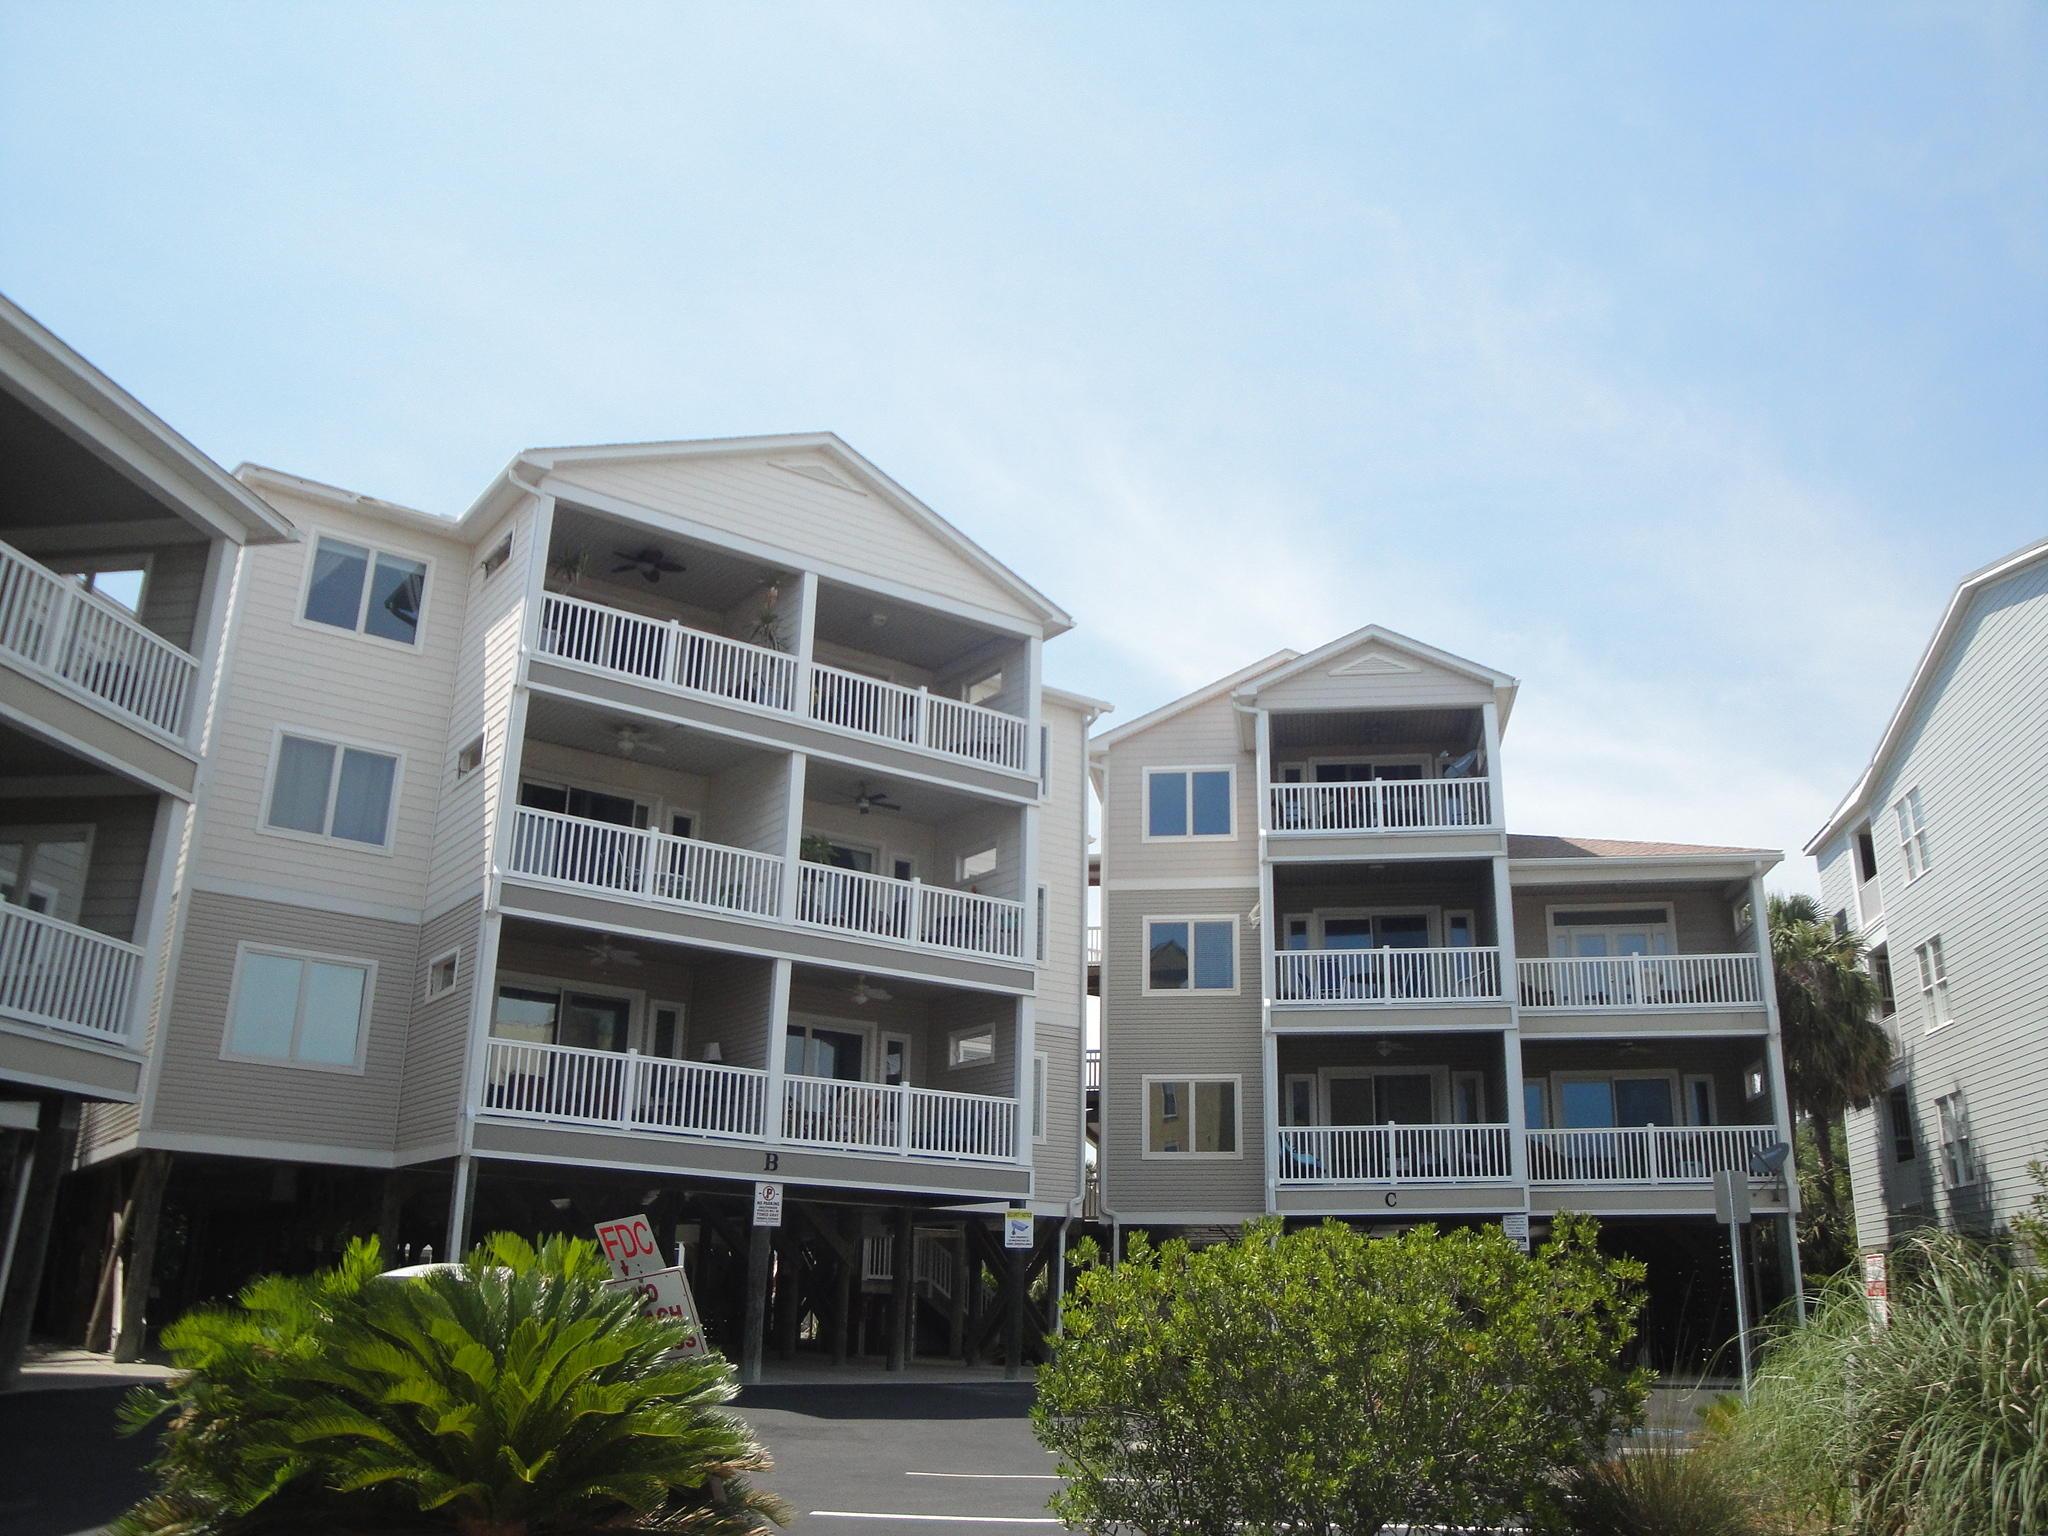 Pier Pointe Villas Homes For Sale - 117 Ashley, Folly Beach, SC - 19